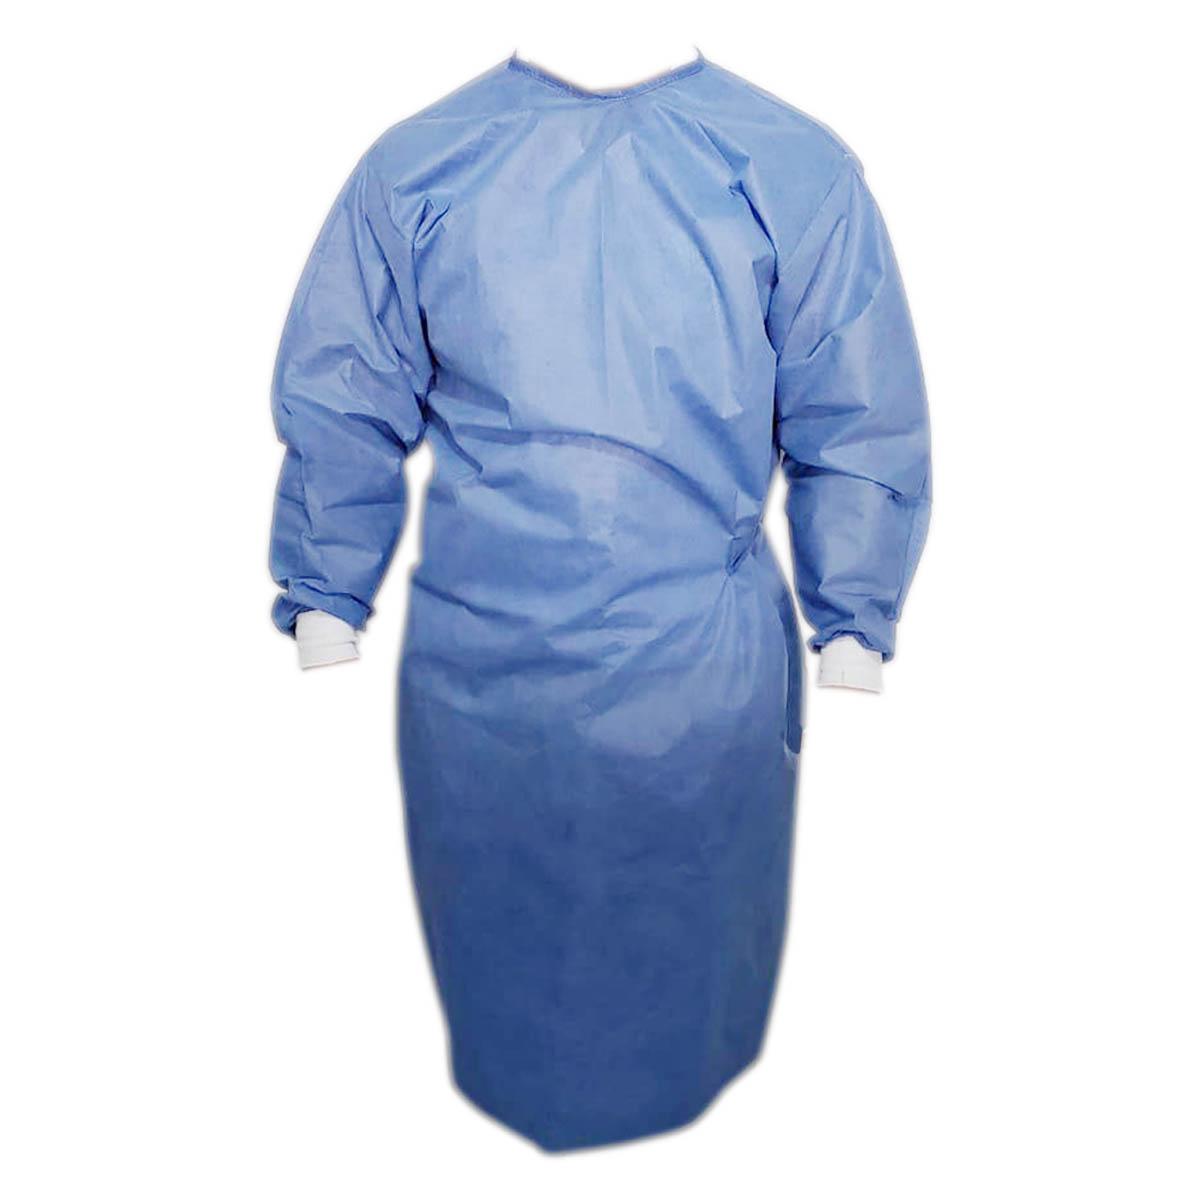 Bata Azul Quirurjica Desechable De Medico Cirujano Quirofano